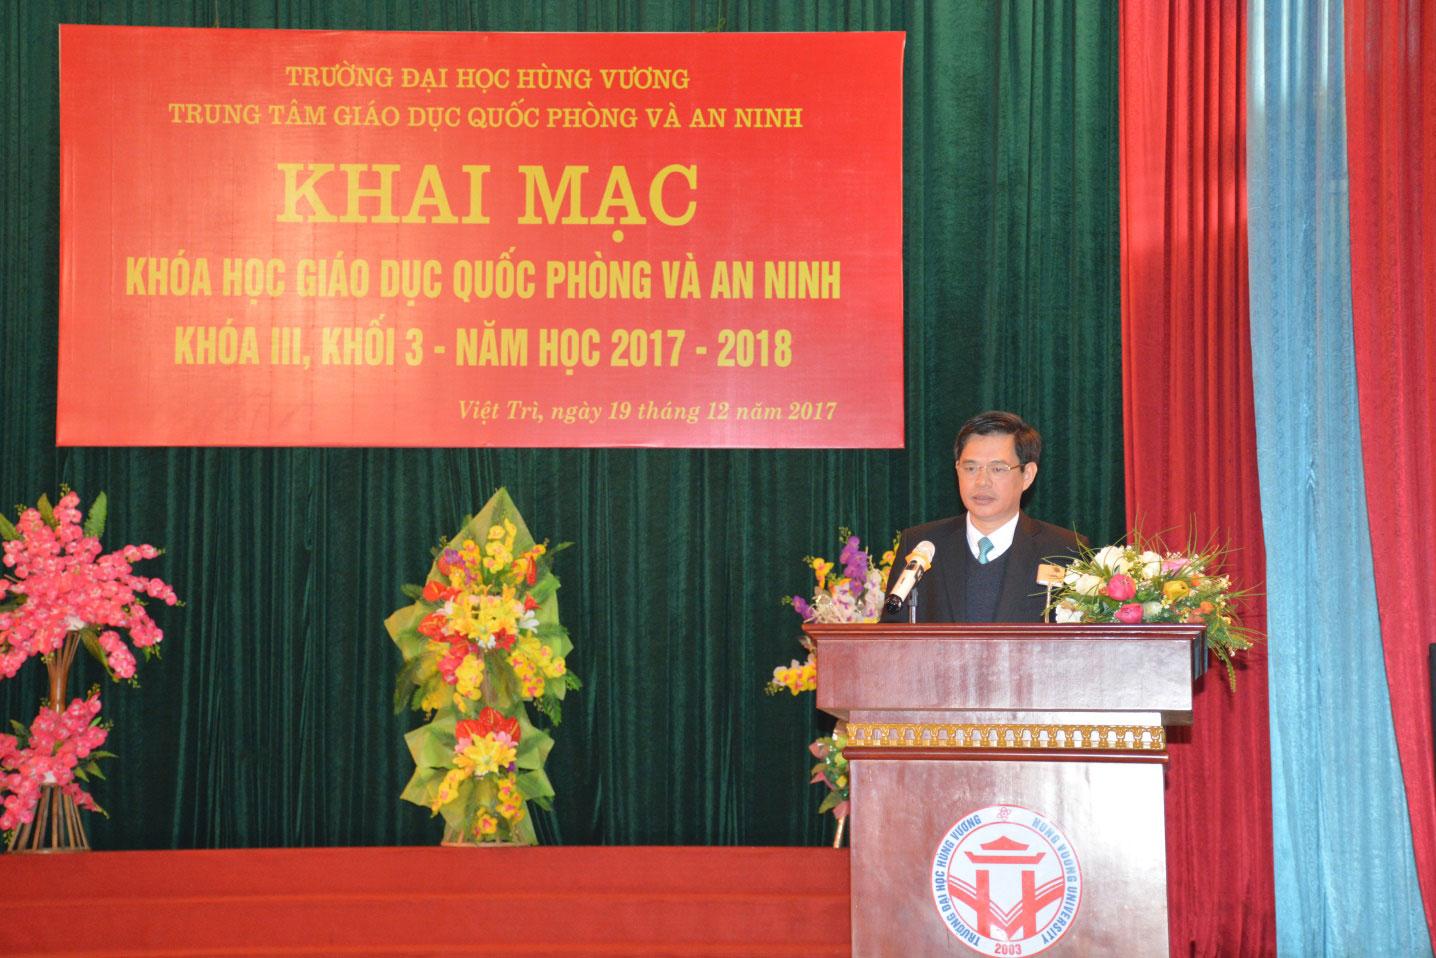 Khai mac khoa hoc Giao duc Quoc phong va An ninh tap trung khoa III, khoi 3, nam hoc 2017 - 2018